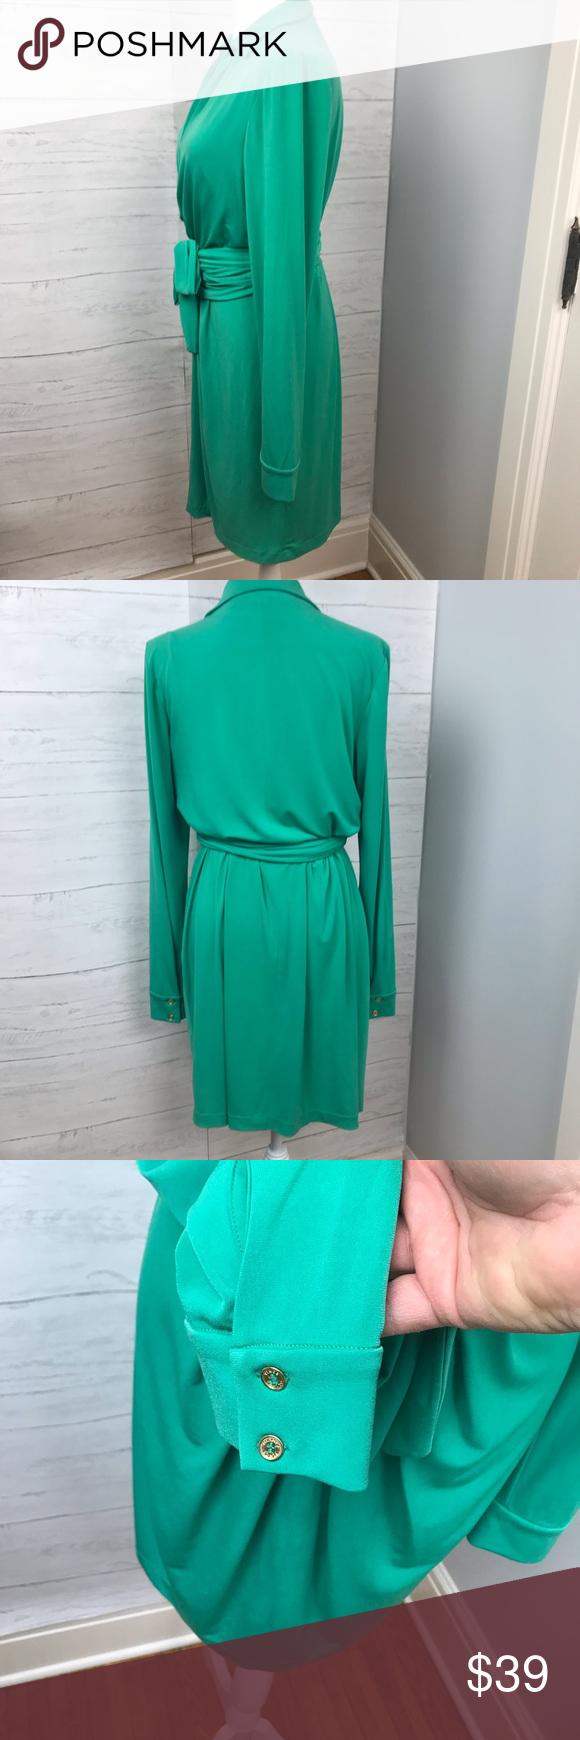 Vince Camuto Weap Dress Clothes Design Green Dress Vince Camuto [ 1740 x 580 Pixel ]